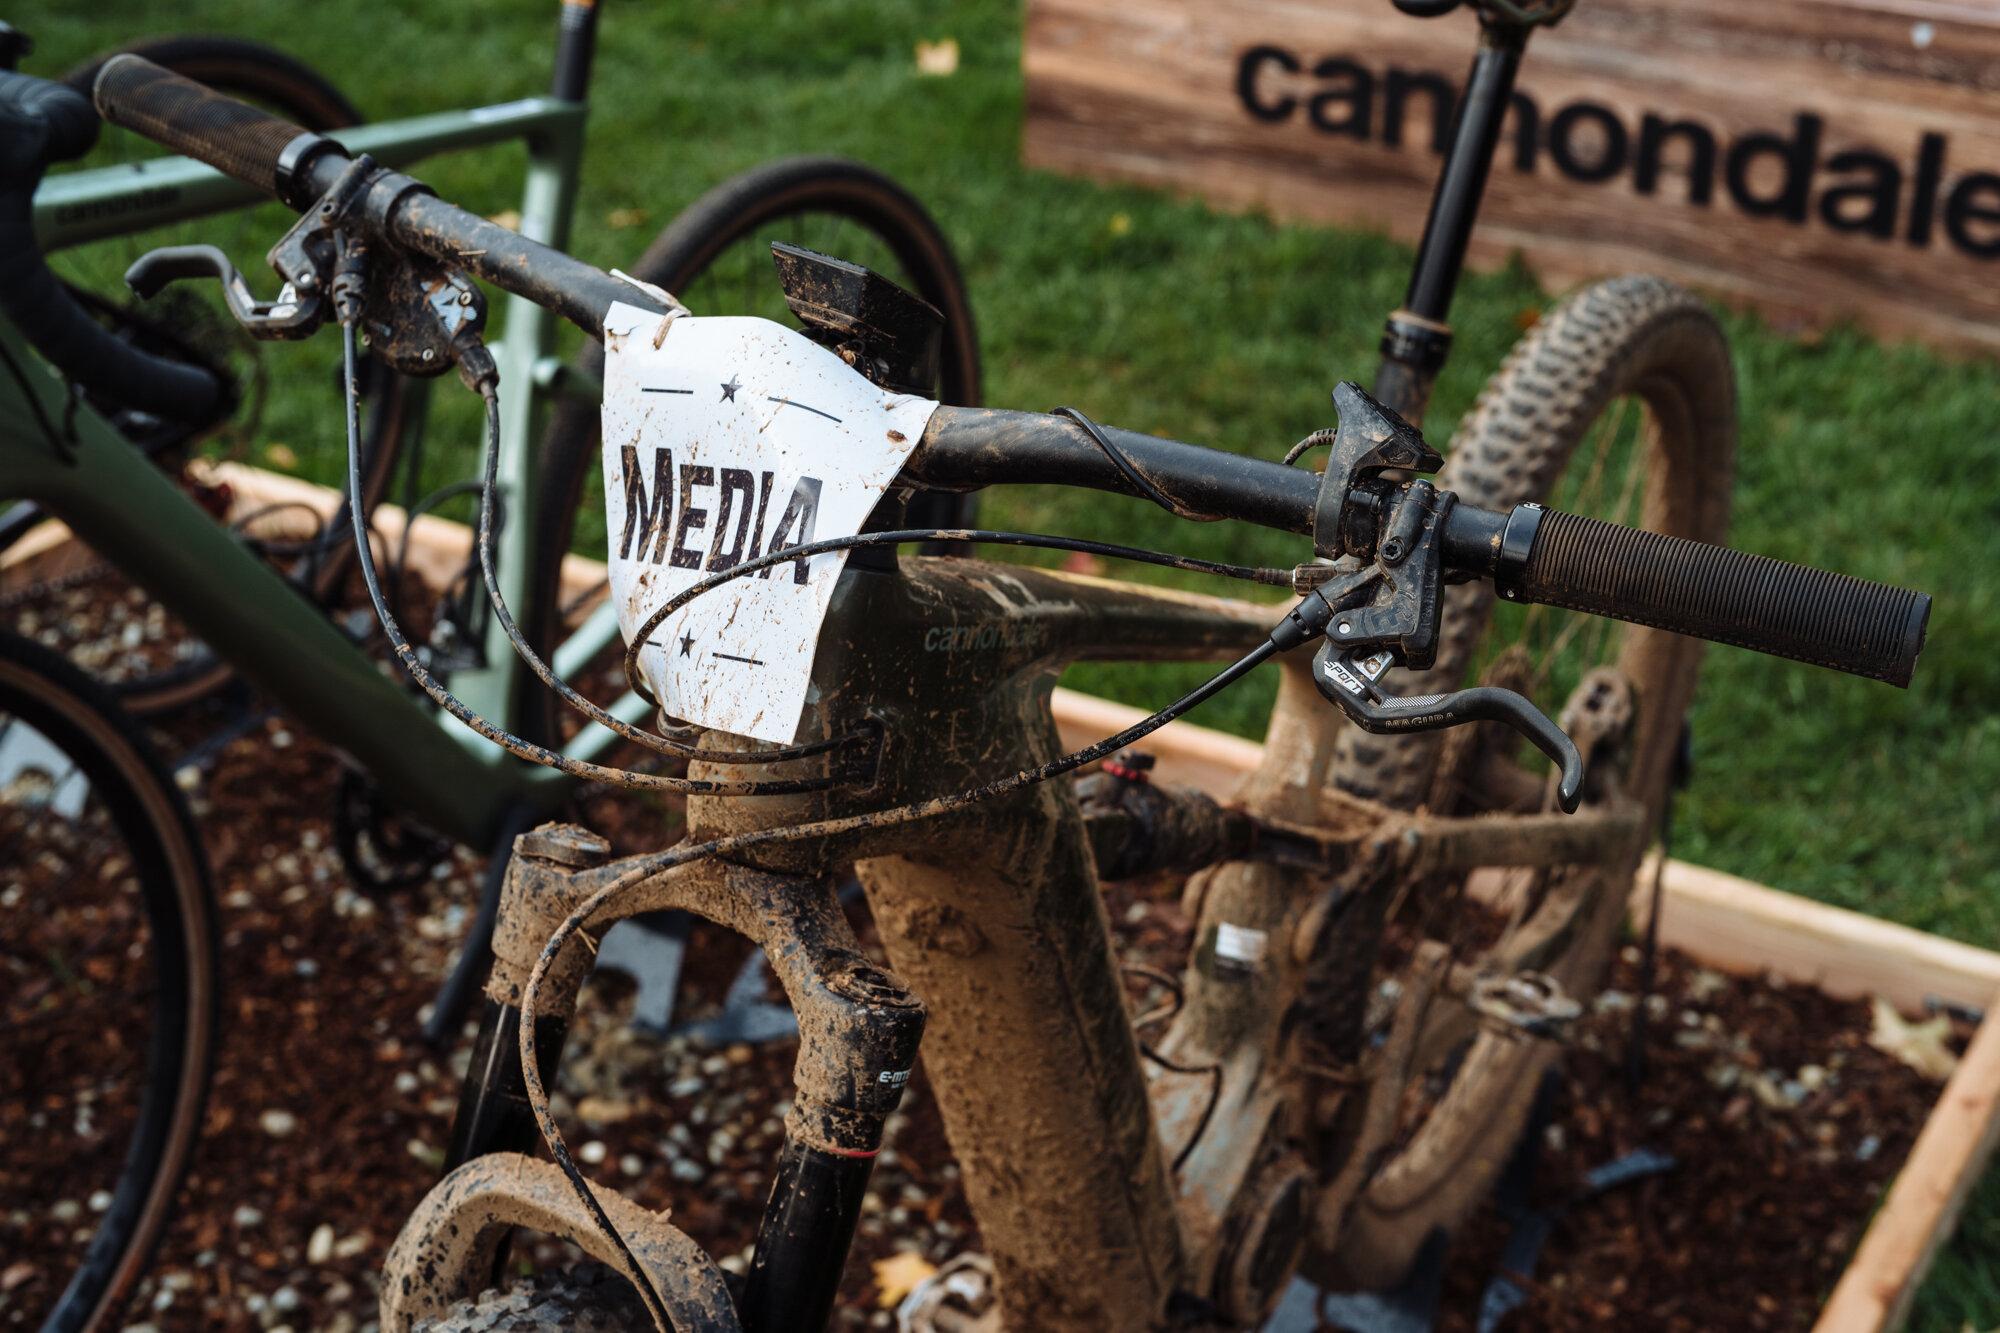 Bike Race Media Dirty Muddy